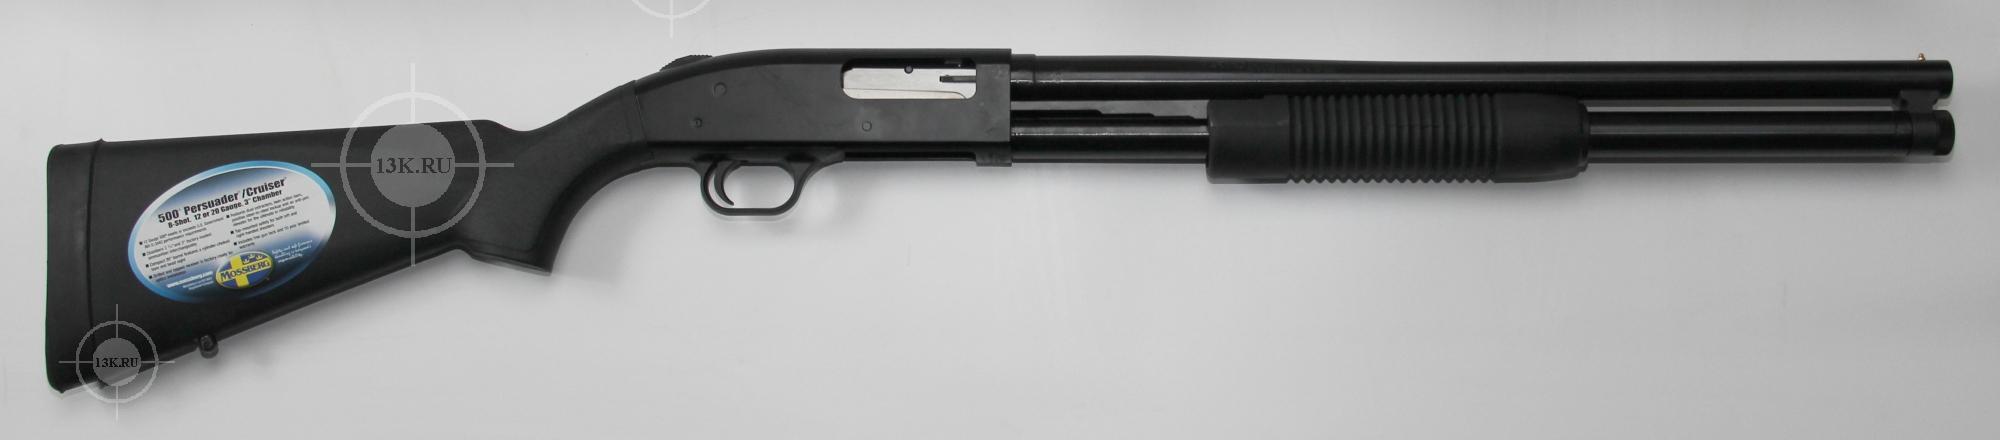 моссберг 590